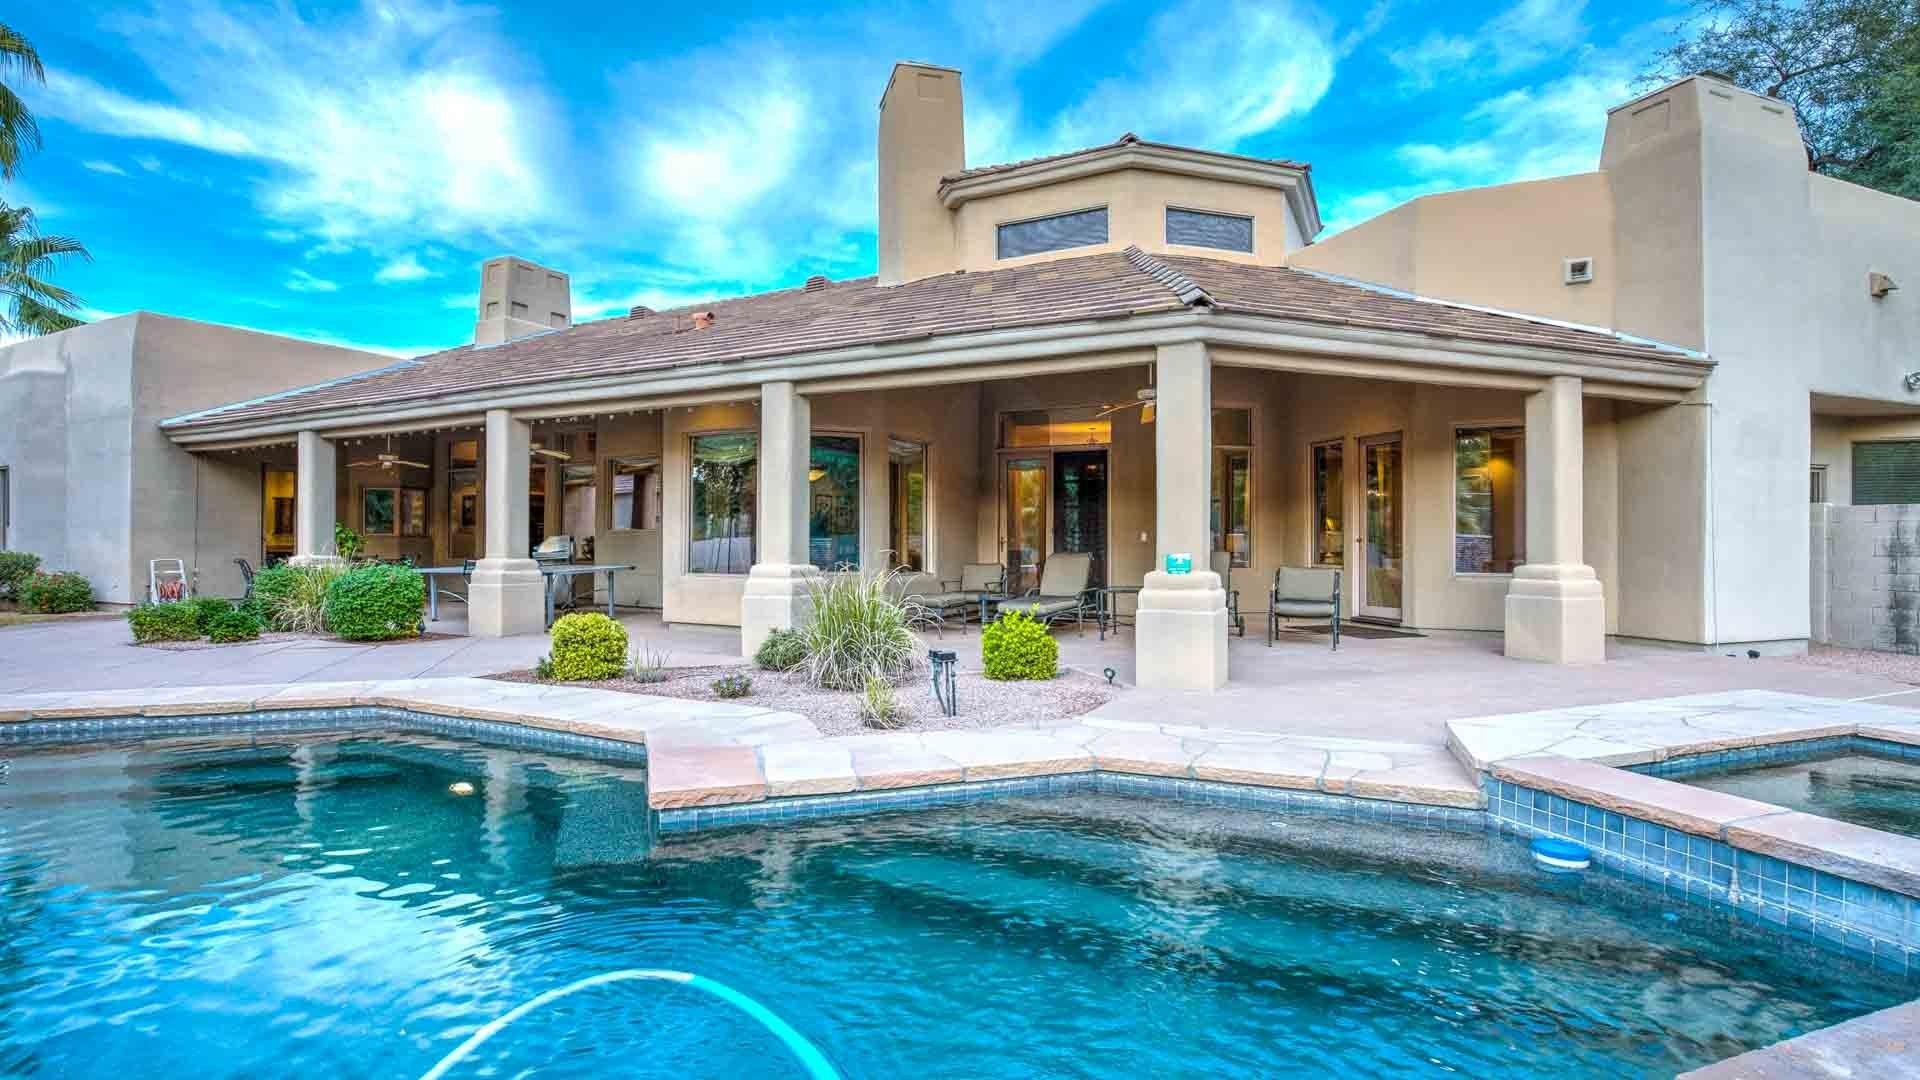 Fabulous Lakewood Ahwatukee Homes For Sale In Phoenix Az Interior Design Ideas Gentotryabchikinfo